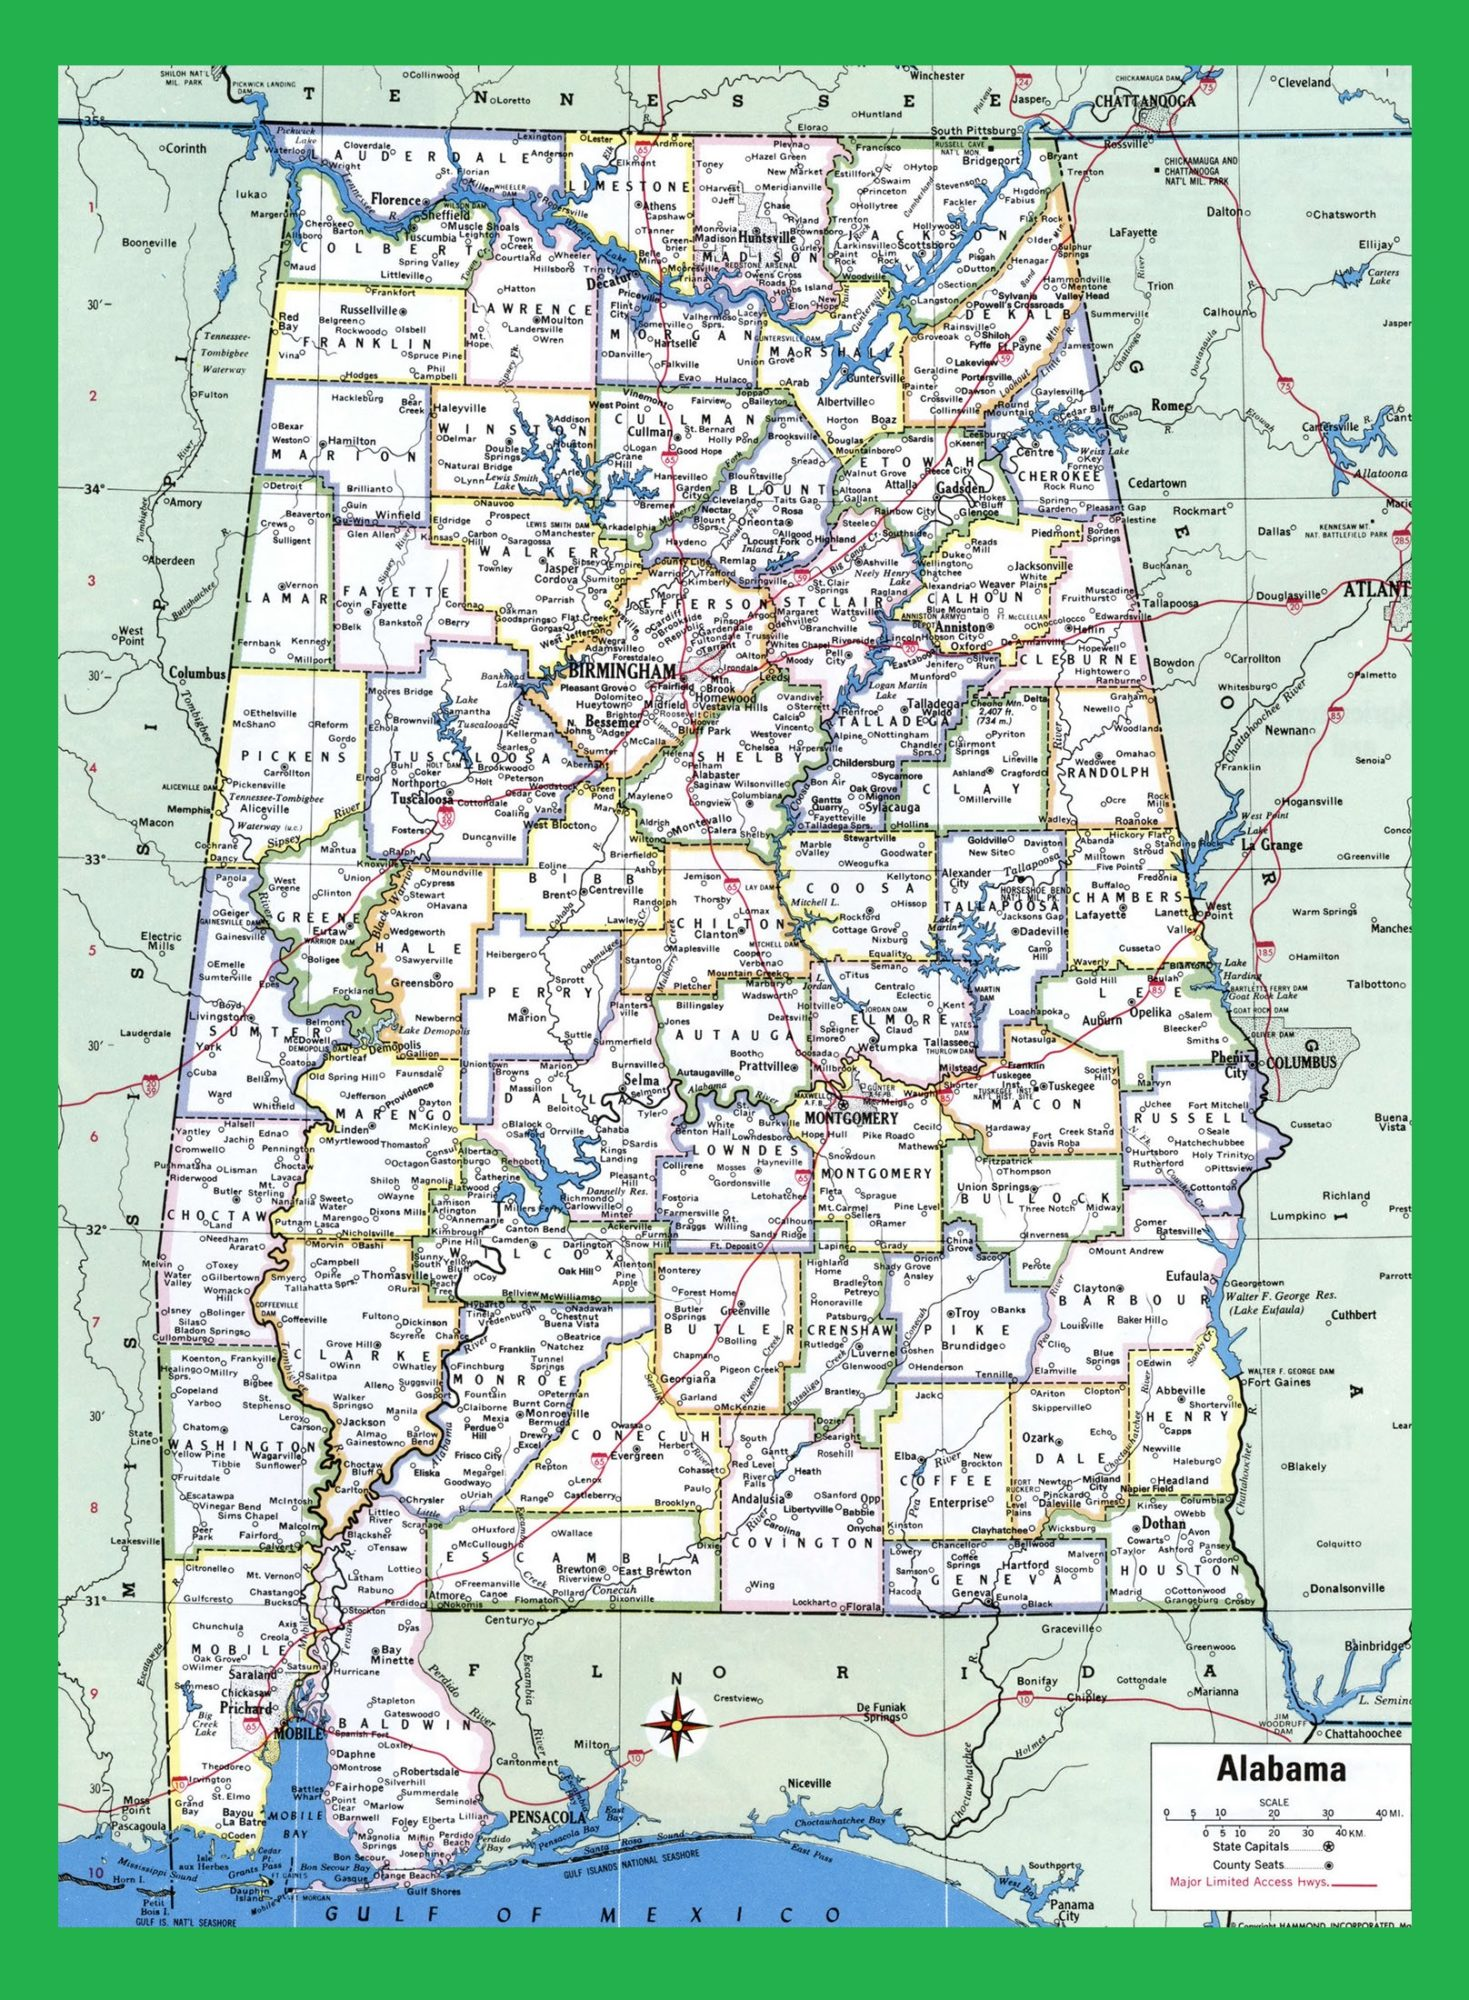 Alabama Large Highway Map | Alabama-city-county-political ... on map of alabama states, alabama state map with major cities, map showing alabama counties, map of alabama gulf coast, map of alabama mountains, north alabama map with cities, map of california cities, map of alabama counties, map of alabama river systems, map of southern alabama, map of al, map of alabama coal mines, map of decatur alabama area, map of alabama caves, map of alabama gulf beaches, map of alabama florida coast, alabama map with all cities, map of alabama games, map of alabama lakes, map of utah cities,